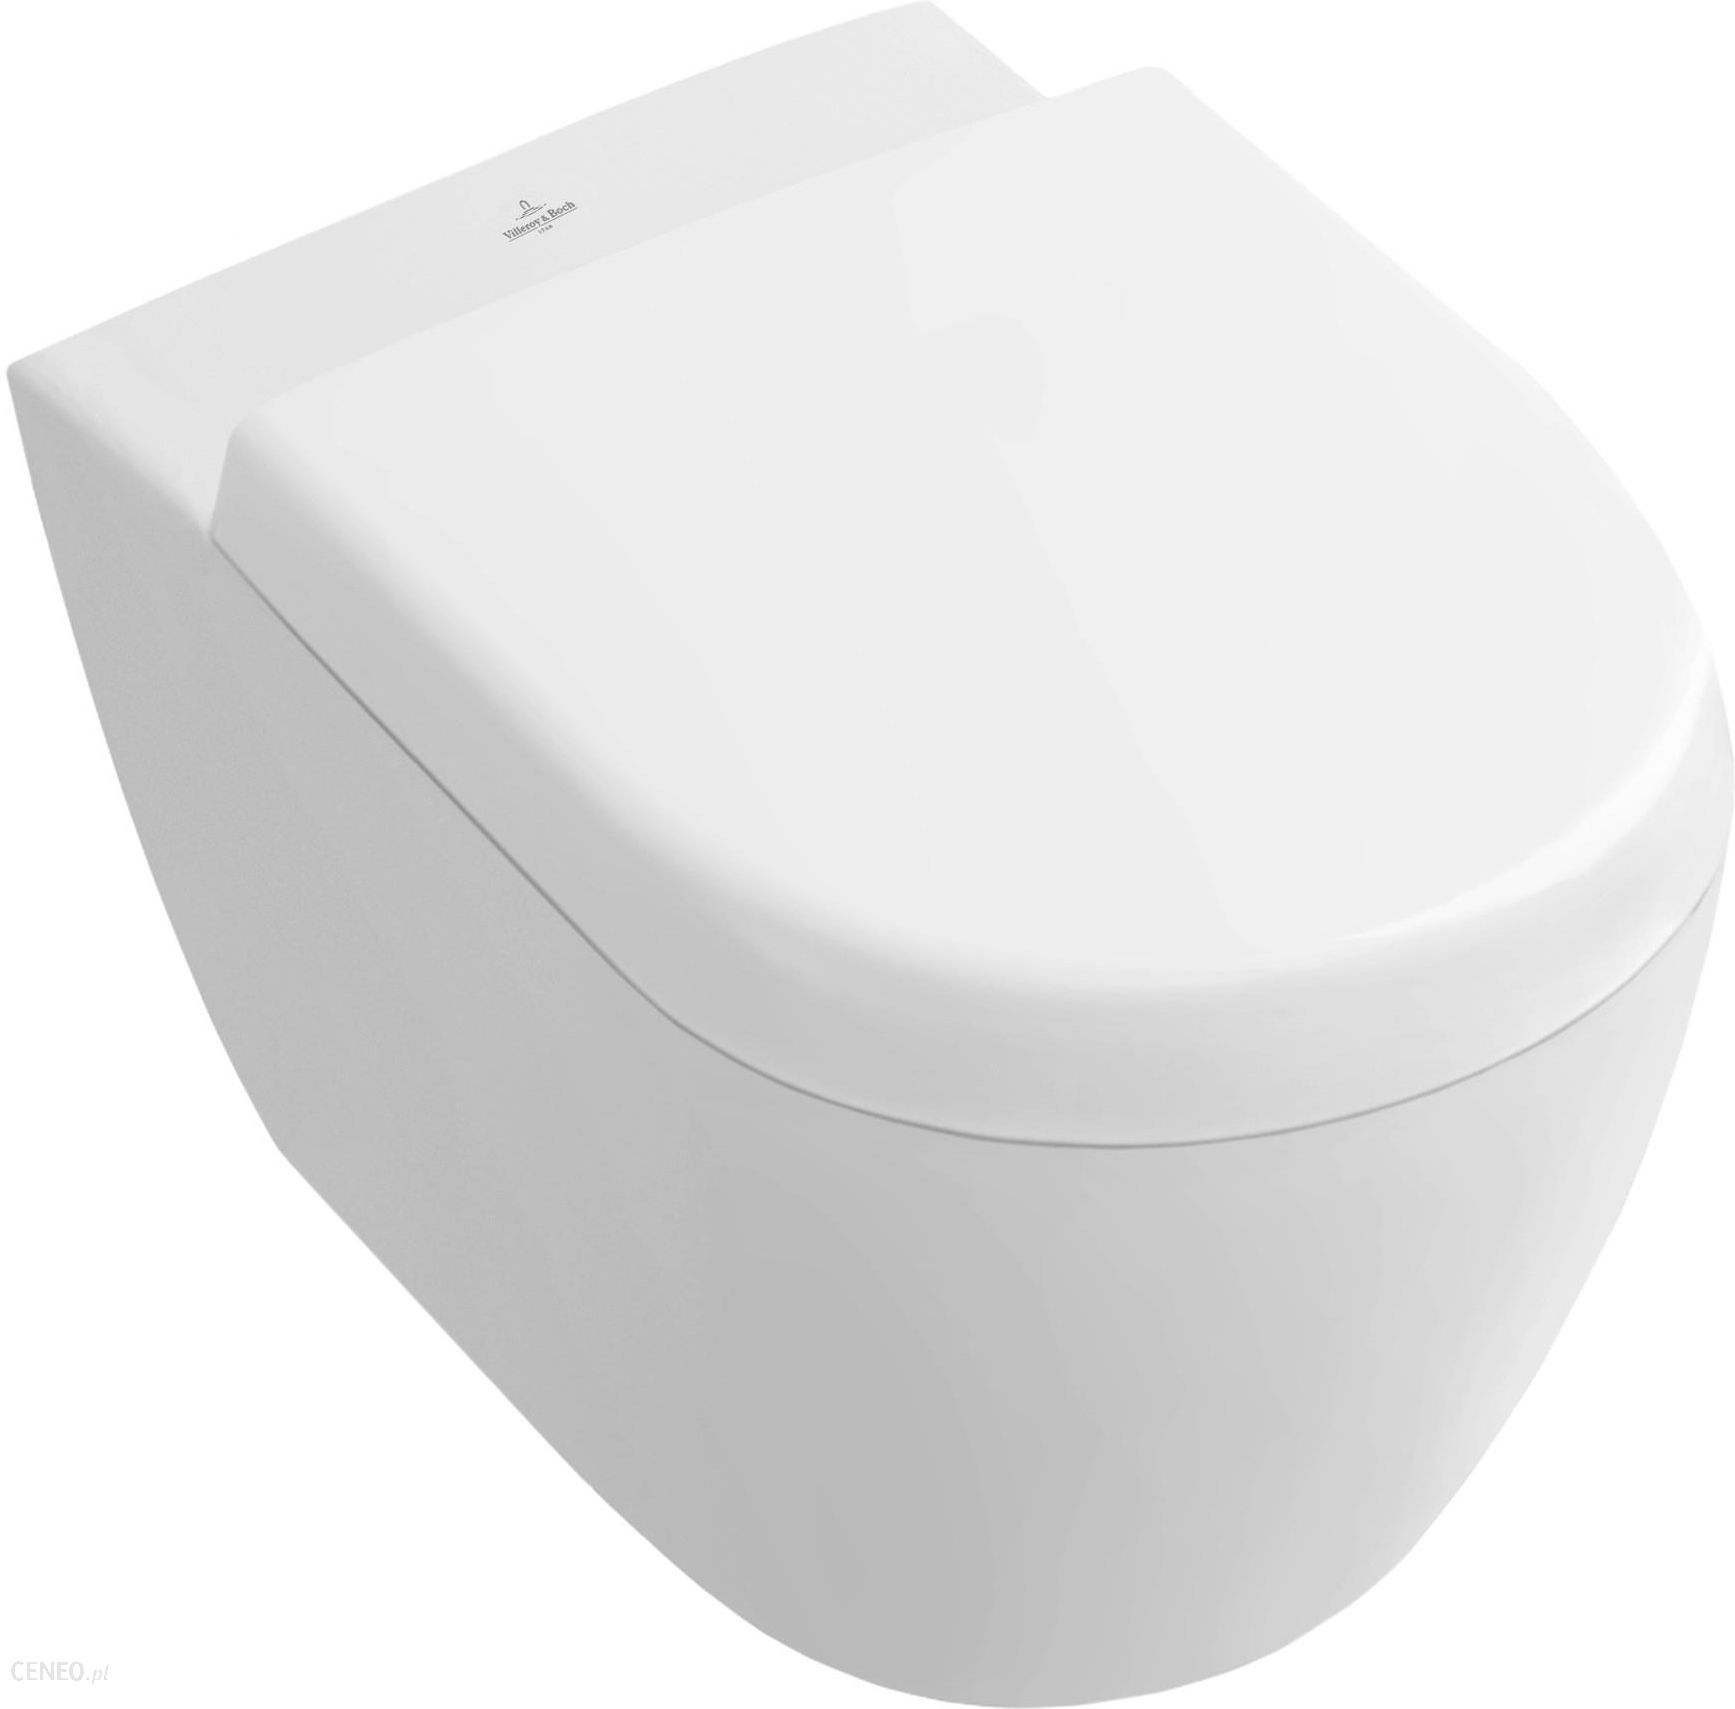 miska wc villeroy boch subway 2 0 ceramicplus 5606r0r1 opinie i ceny na. Black Bedroom Furniture Sets. Home Design Ideas